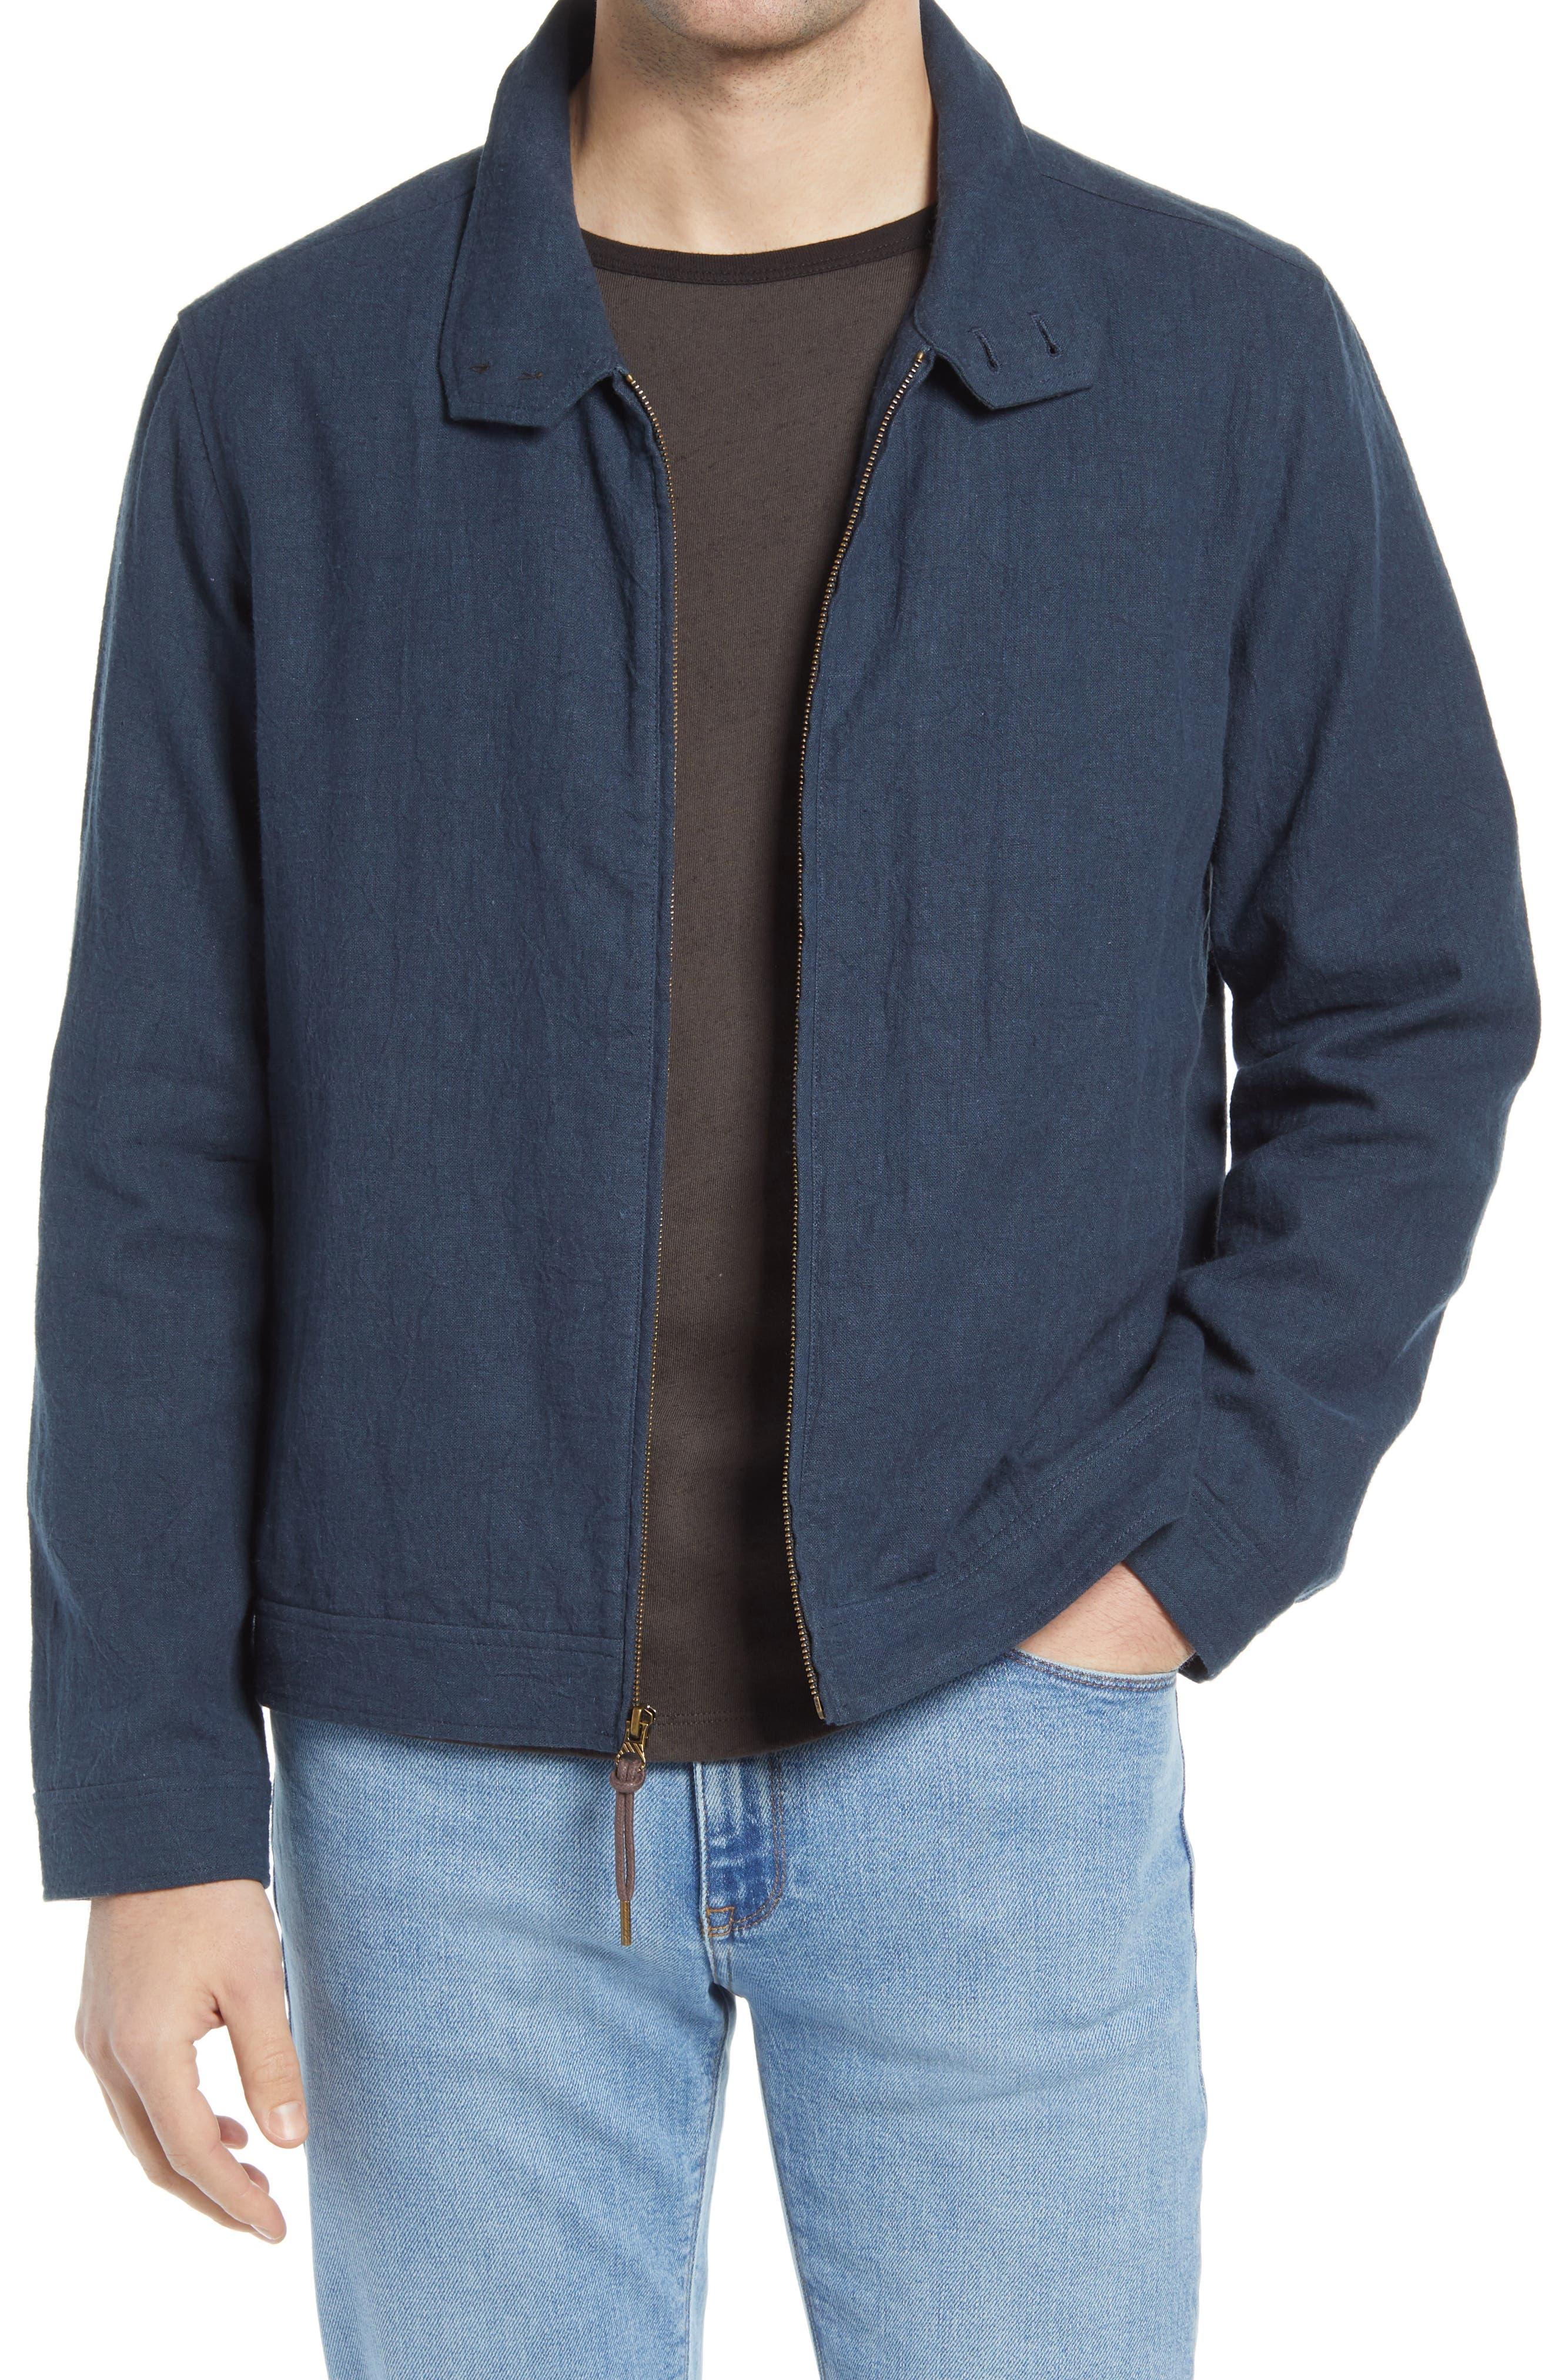 Barracuda Linen & Cotton Jacket